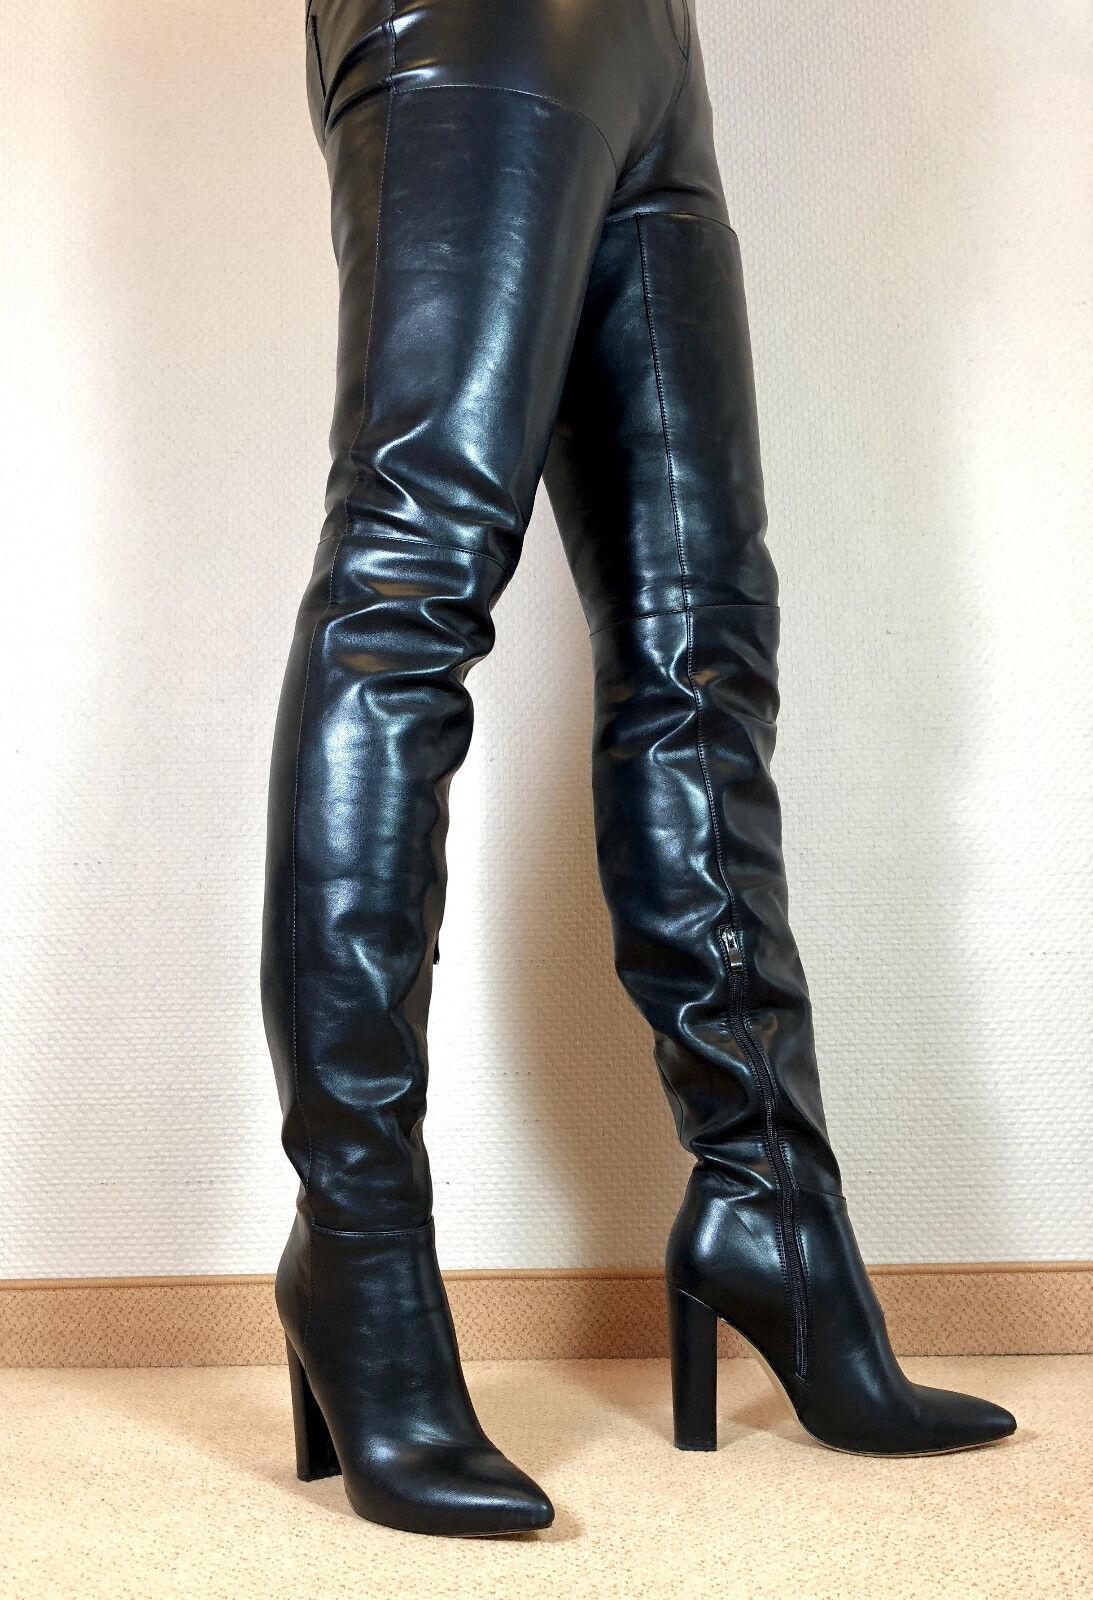 Talla 46 top  en exclusiva sexy zapatos señora botas altas Stiletto botas hombres botas f5